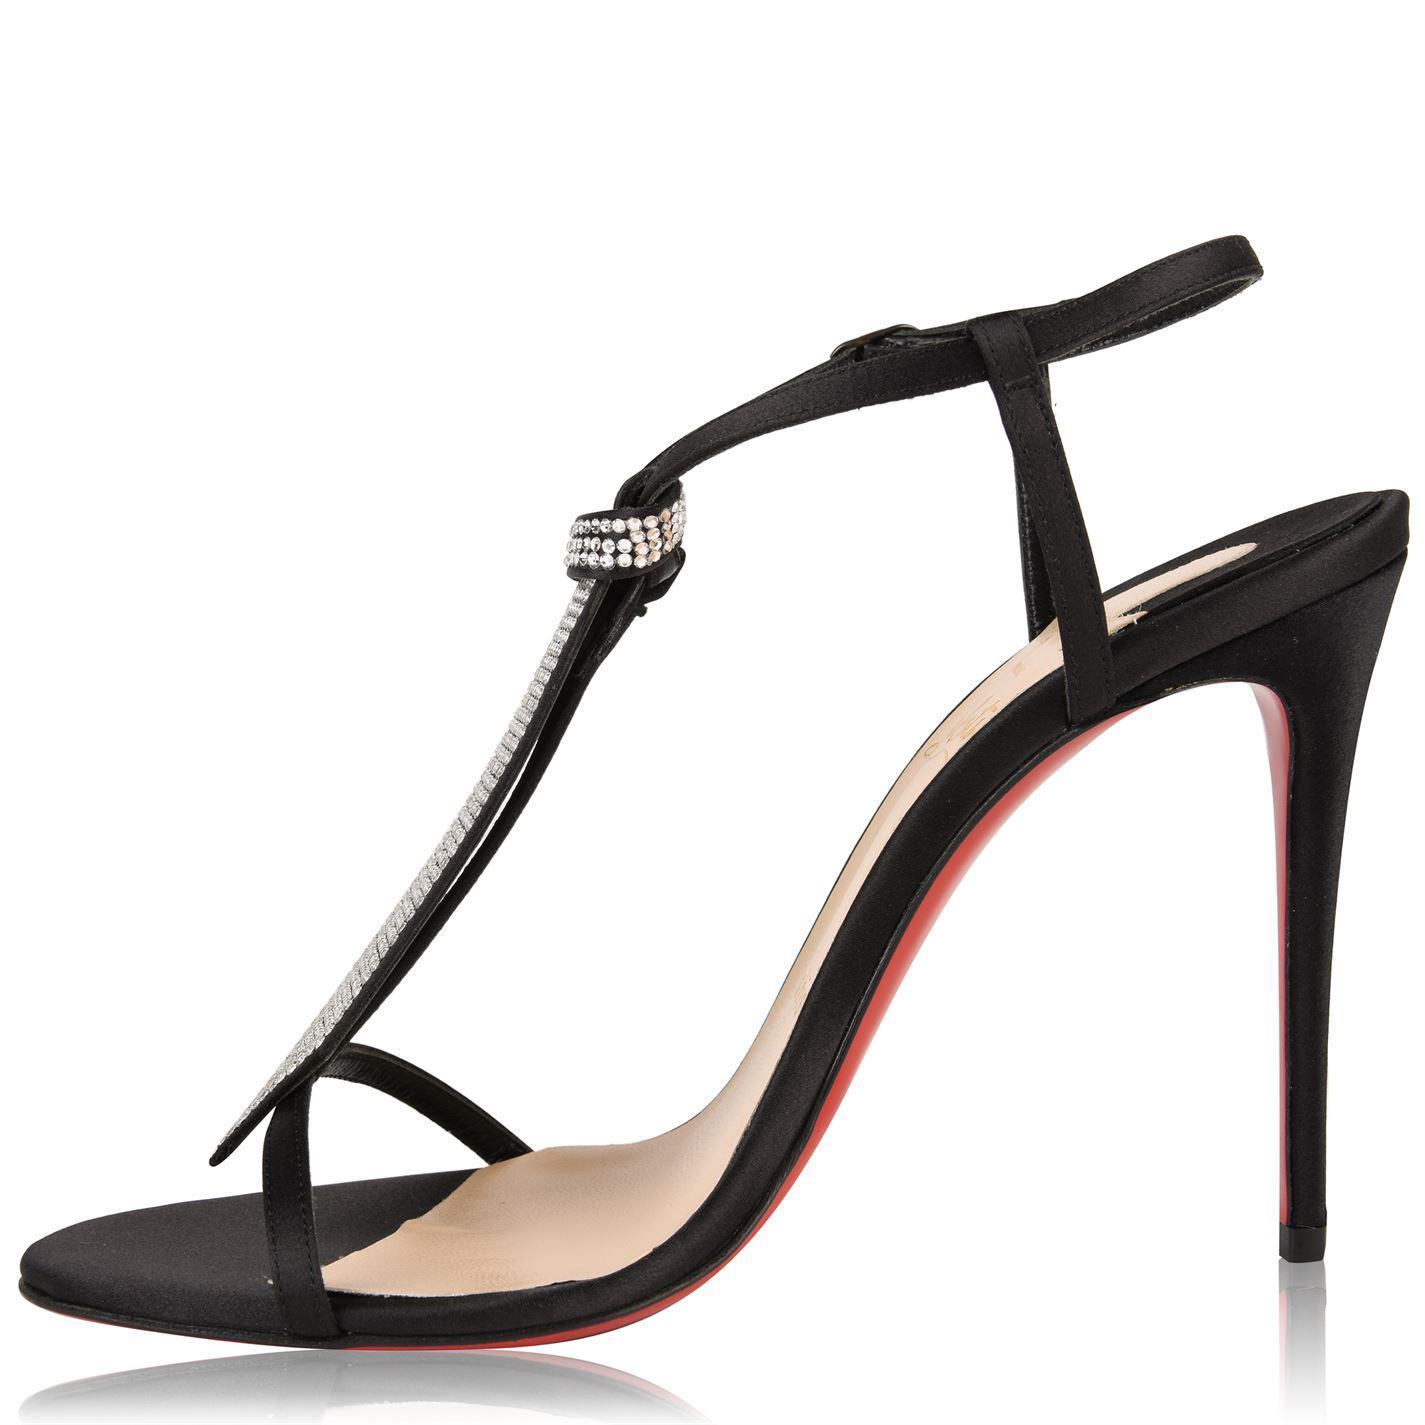 ed63ecf5c41 Christian Louboutin - Black T Cab Satin Crepe Heeled Sandals - Lyst. View  fullscreen